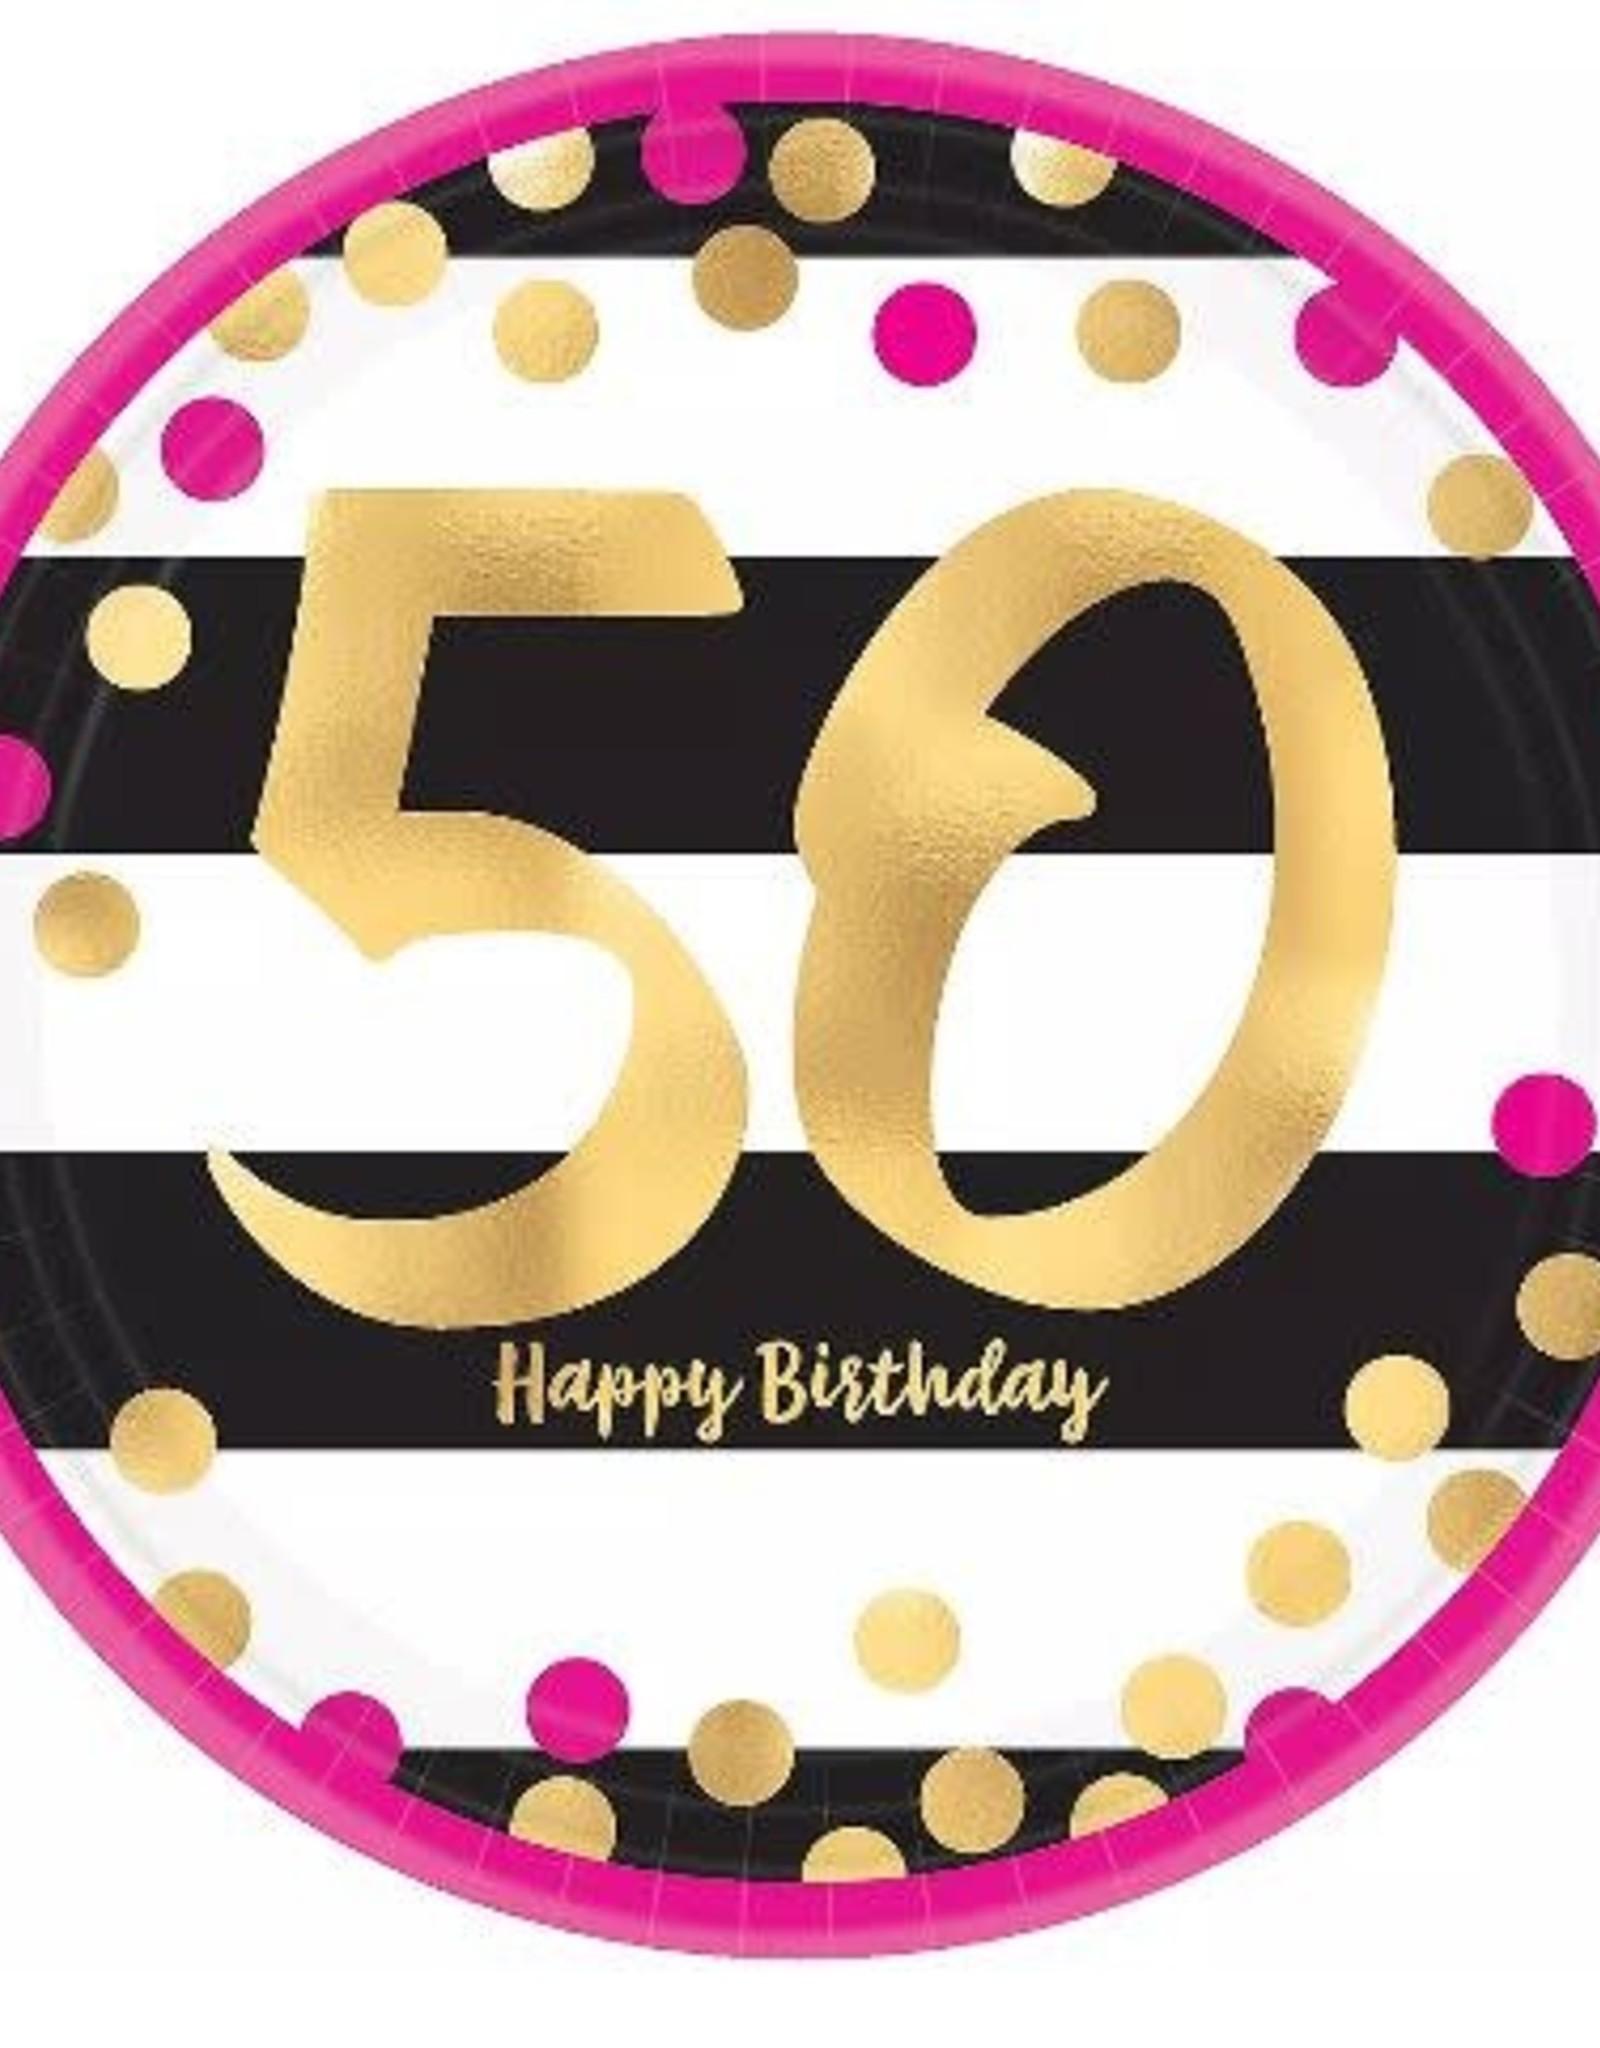 50th Birthday Dessert Plate 8ct